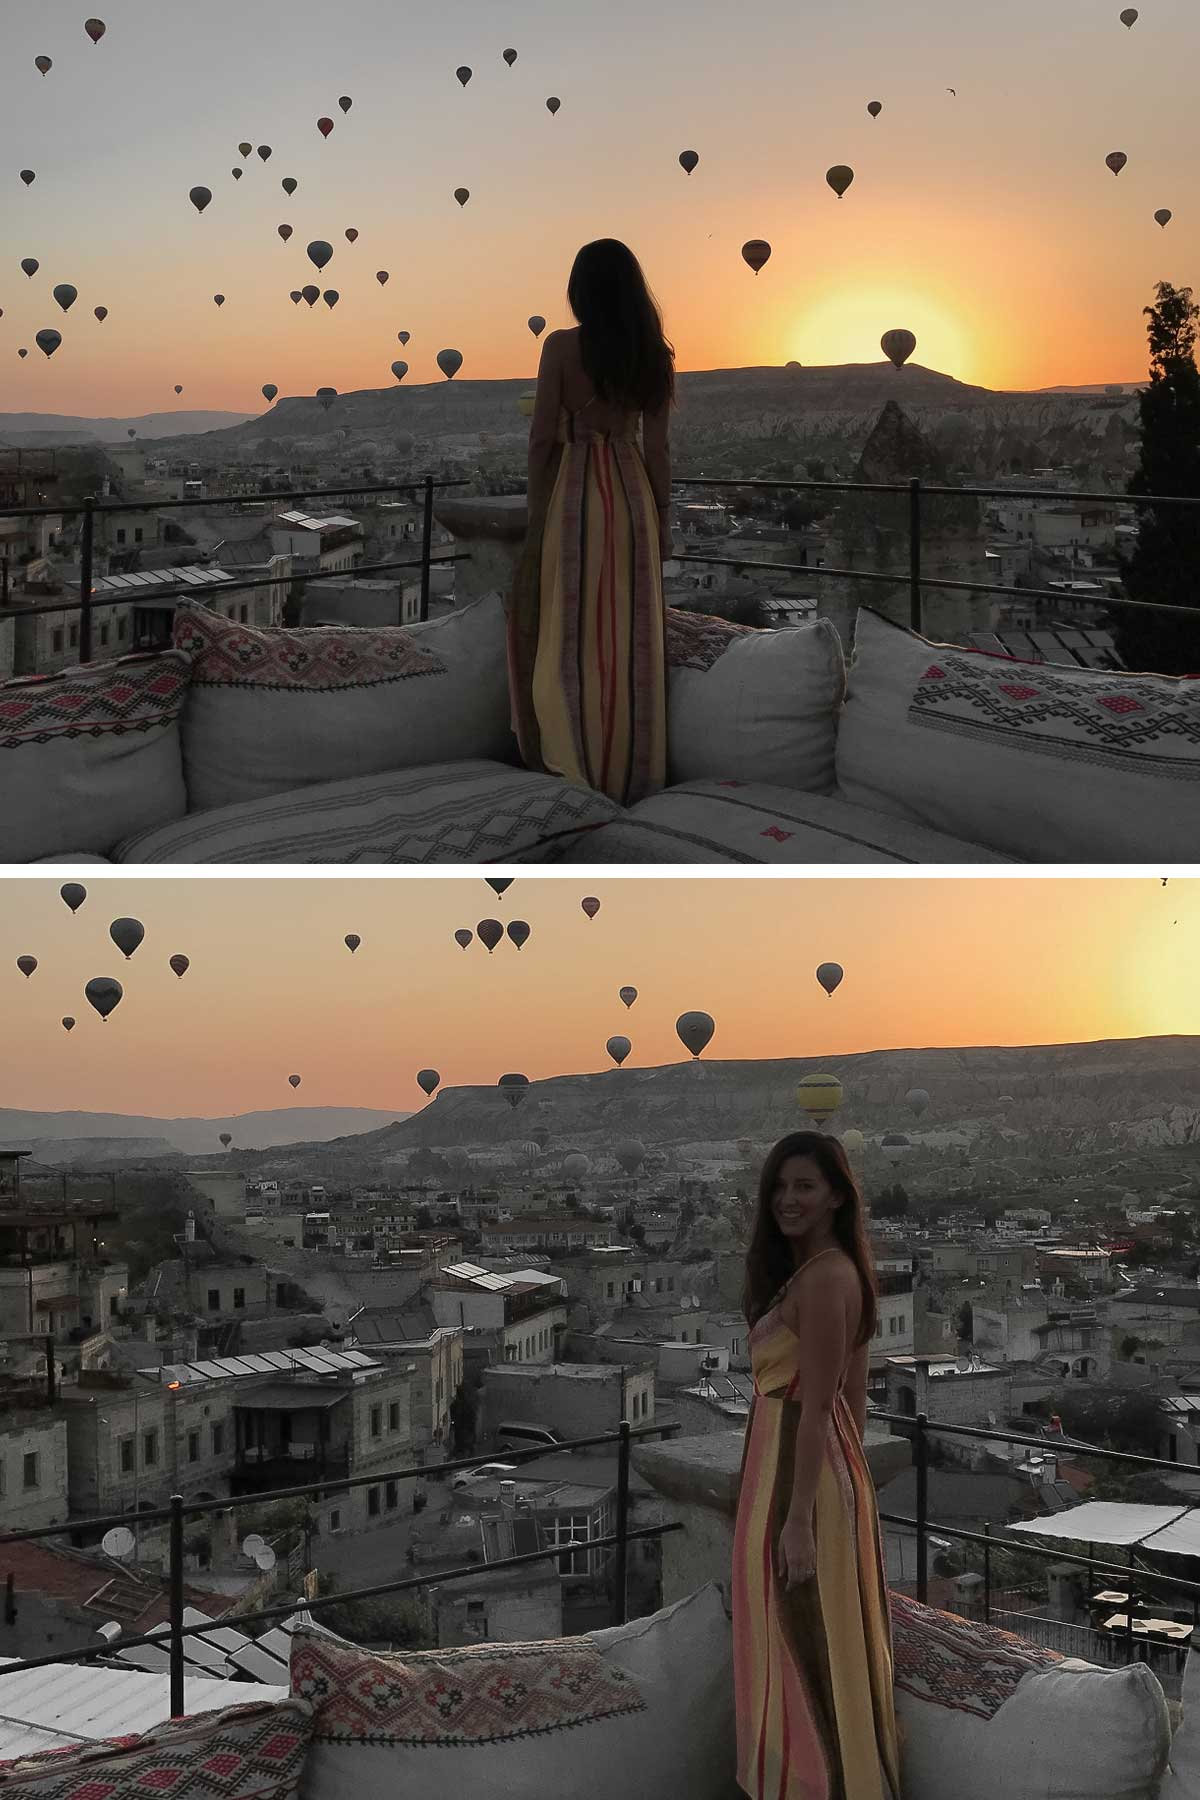 Rachel in Cappadocia, Turkey